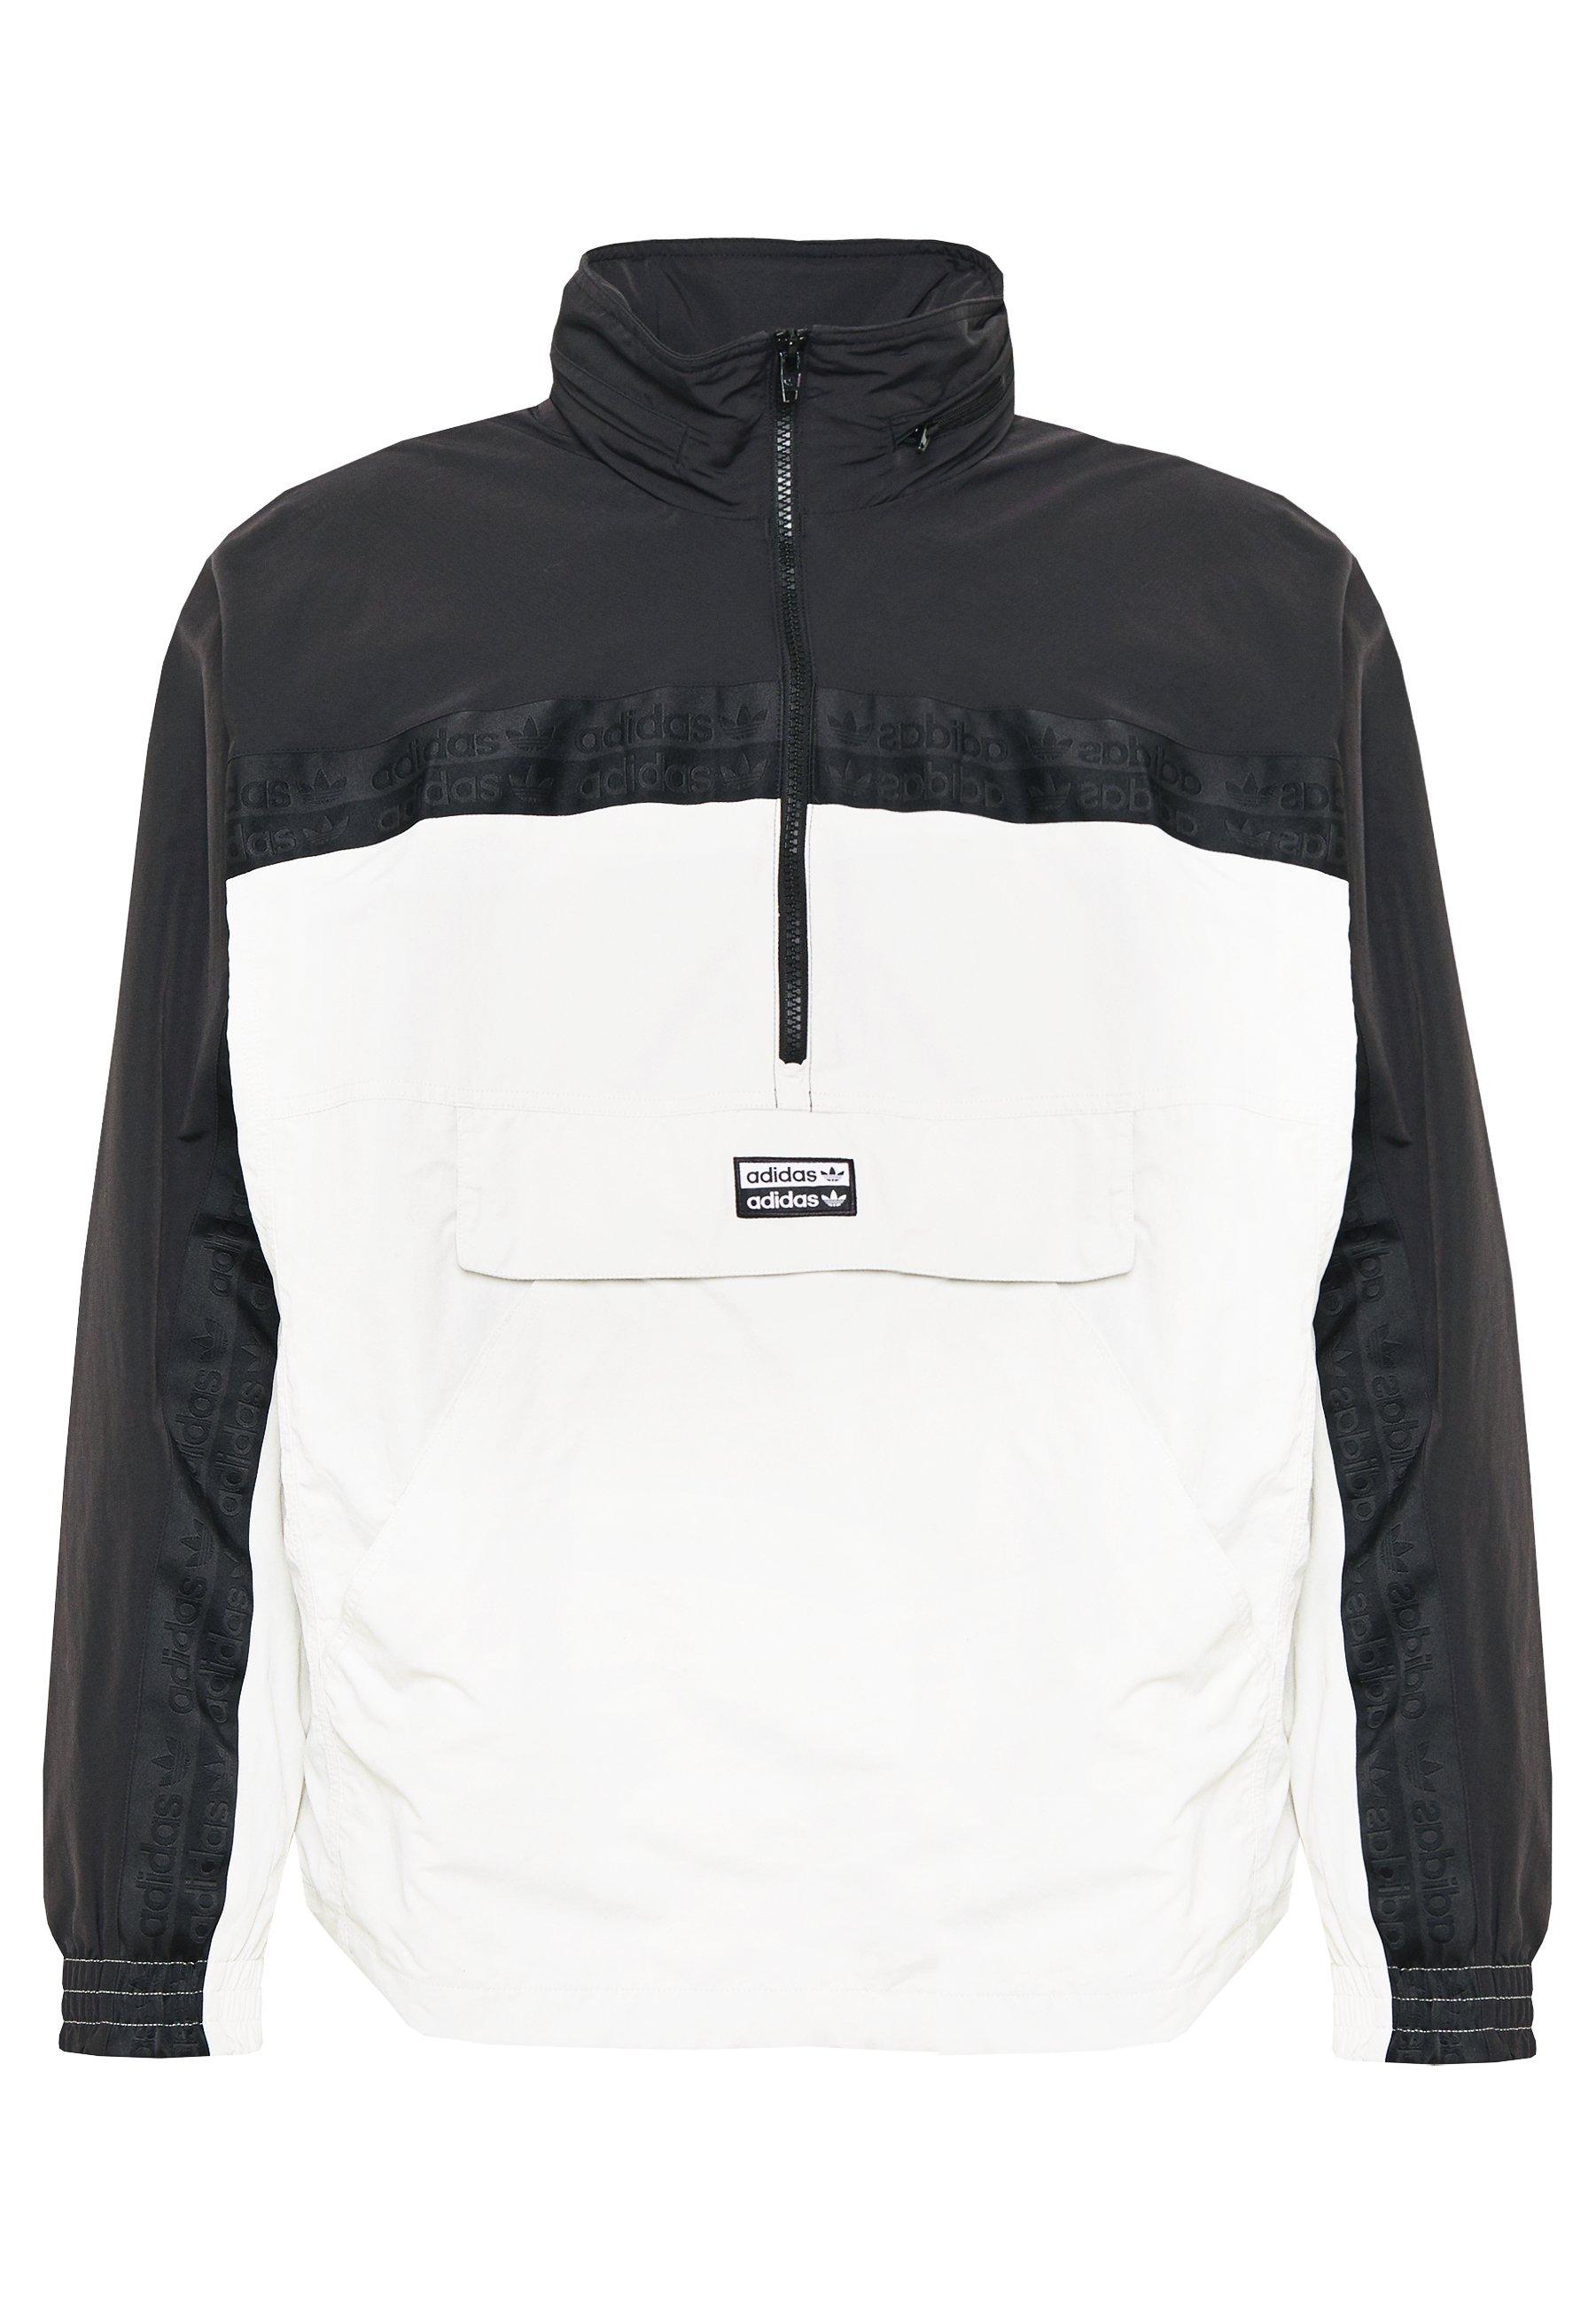 Veste coupe vent adidas Originals X White Mountaineering